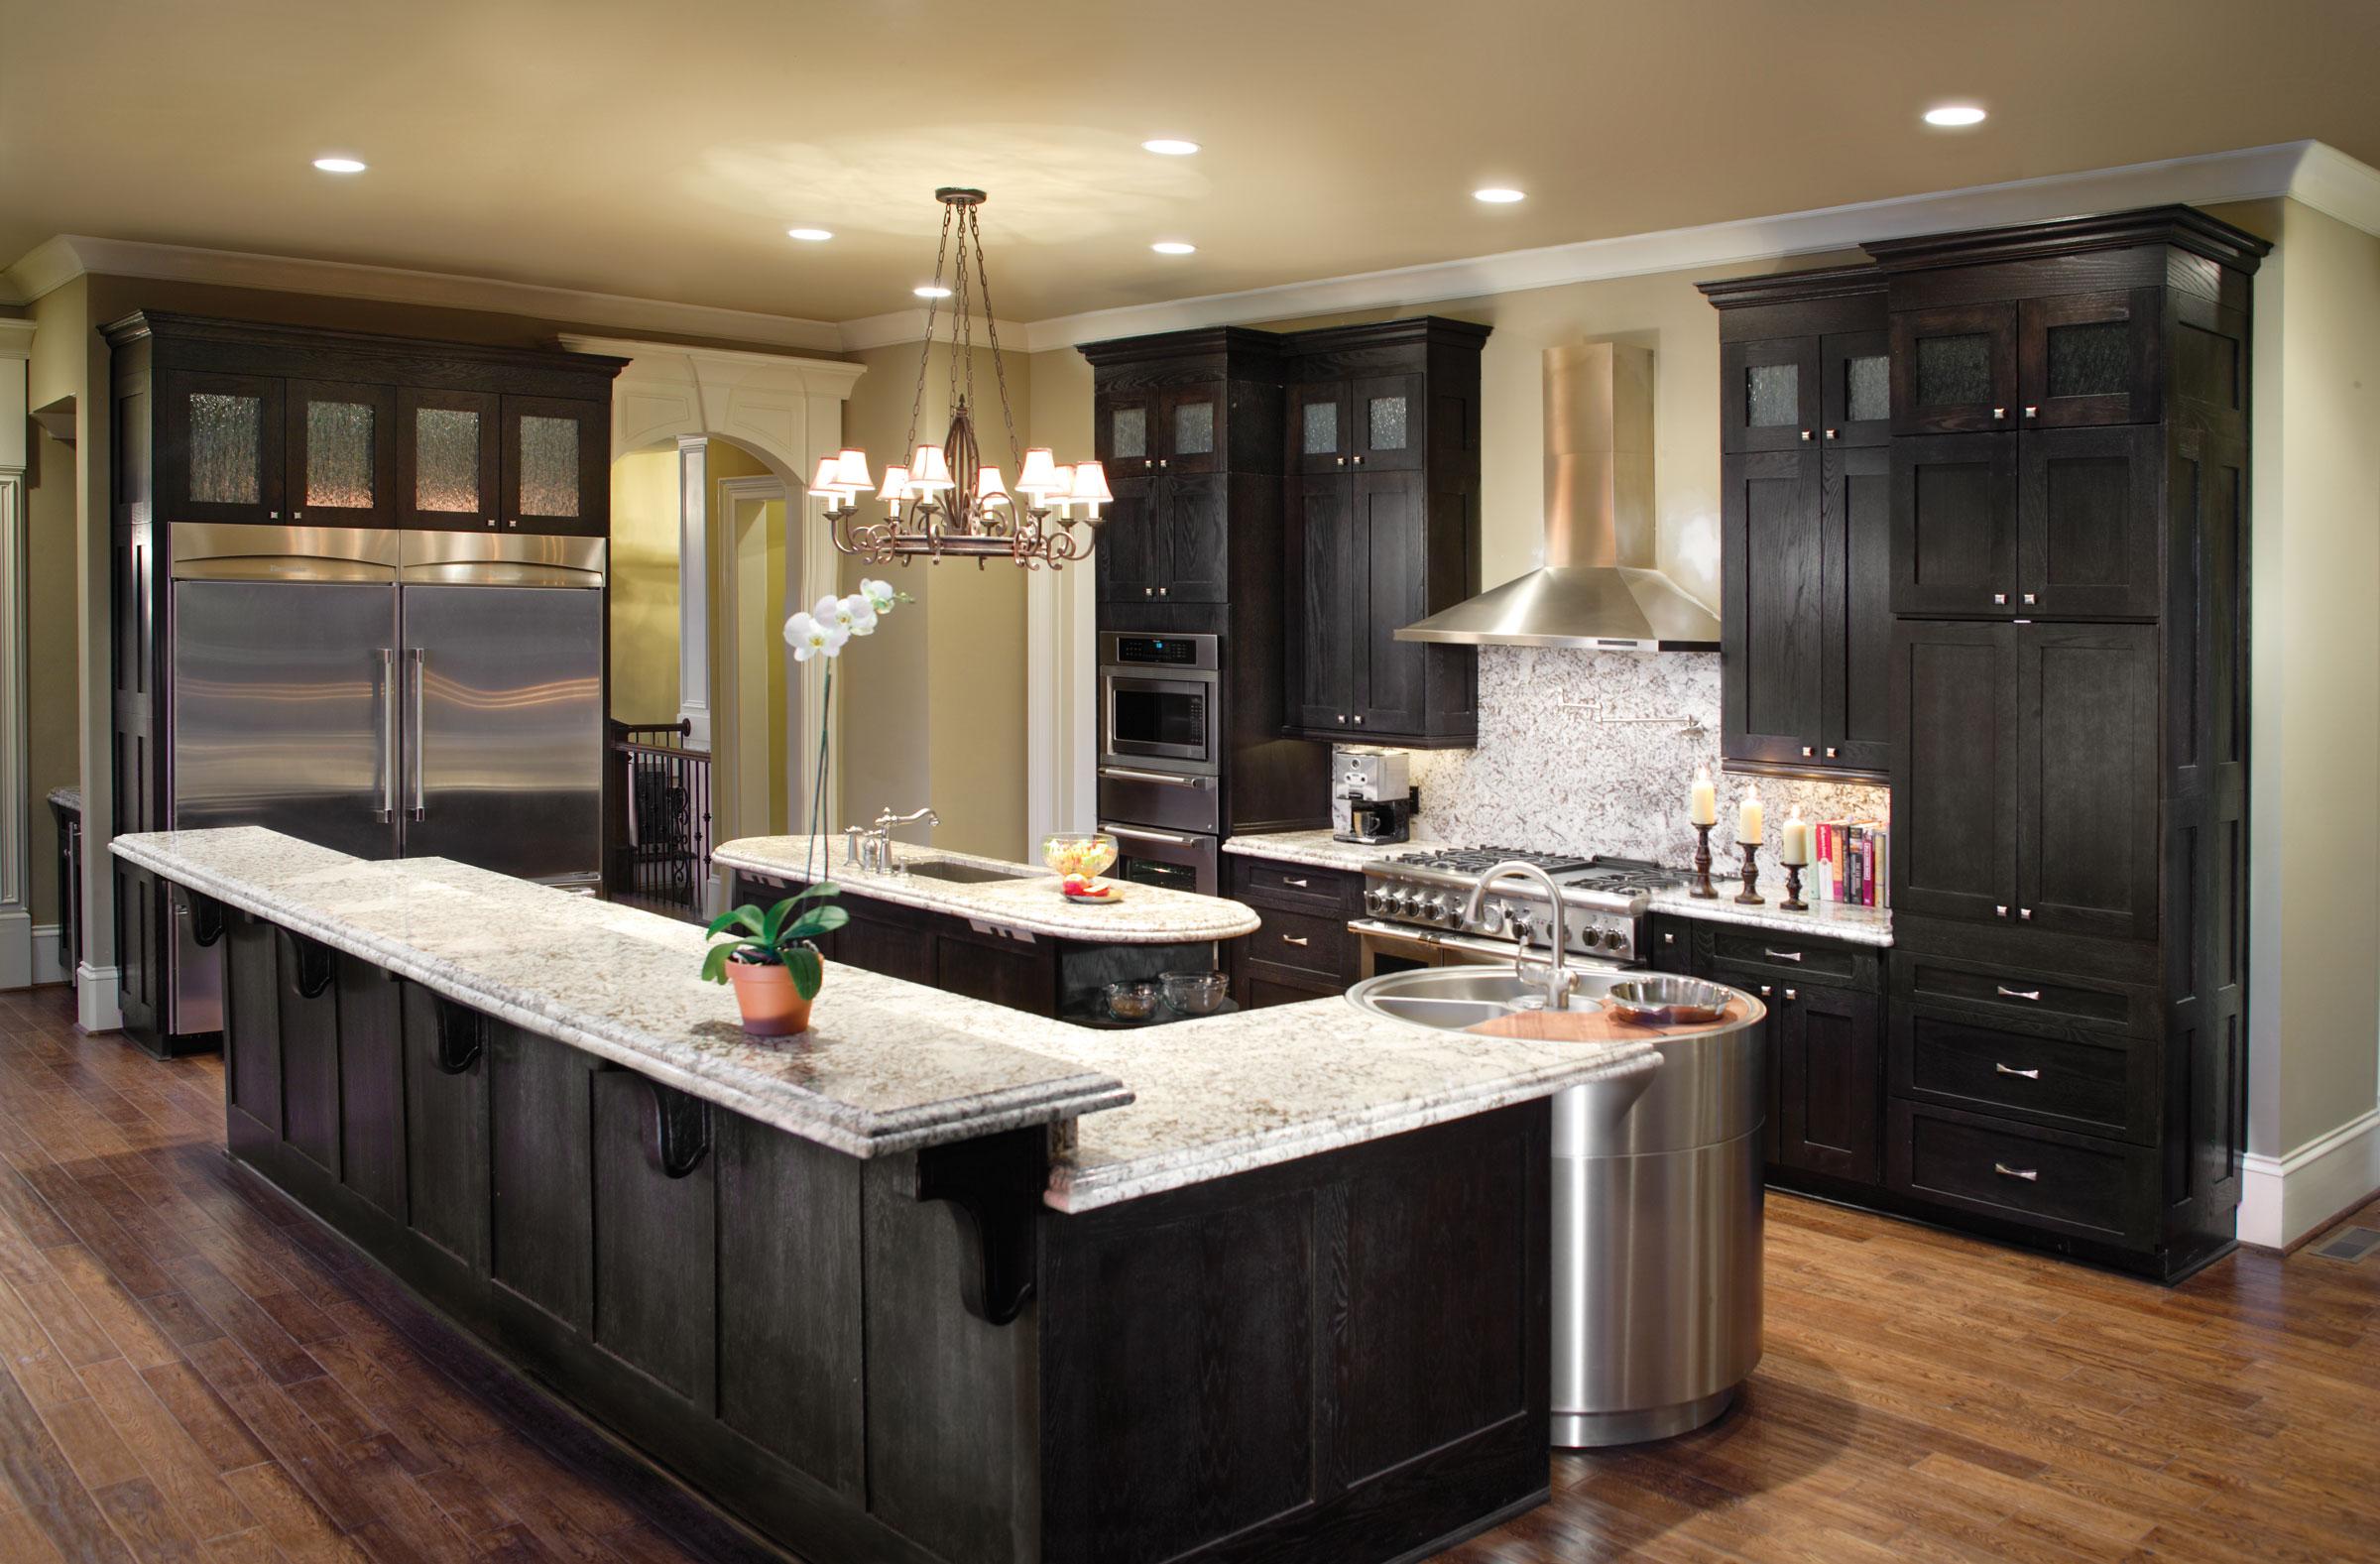 Custom Bathroom  Kitchen Cabinets  Phoenix  Cabinets by